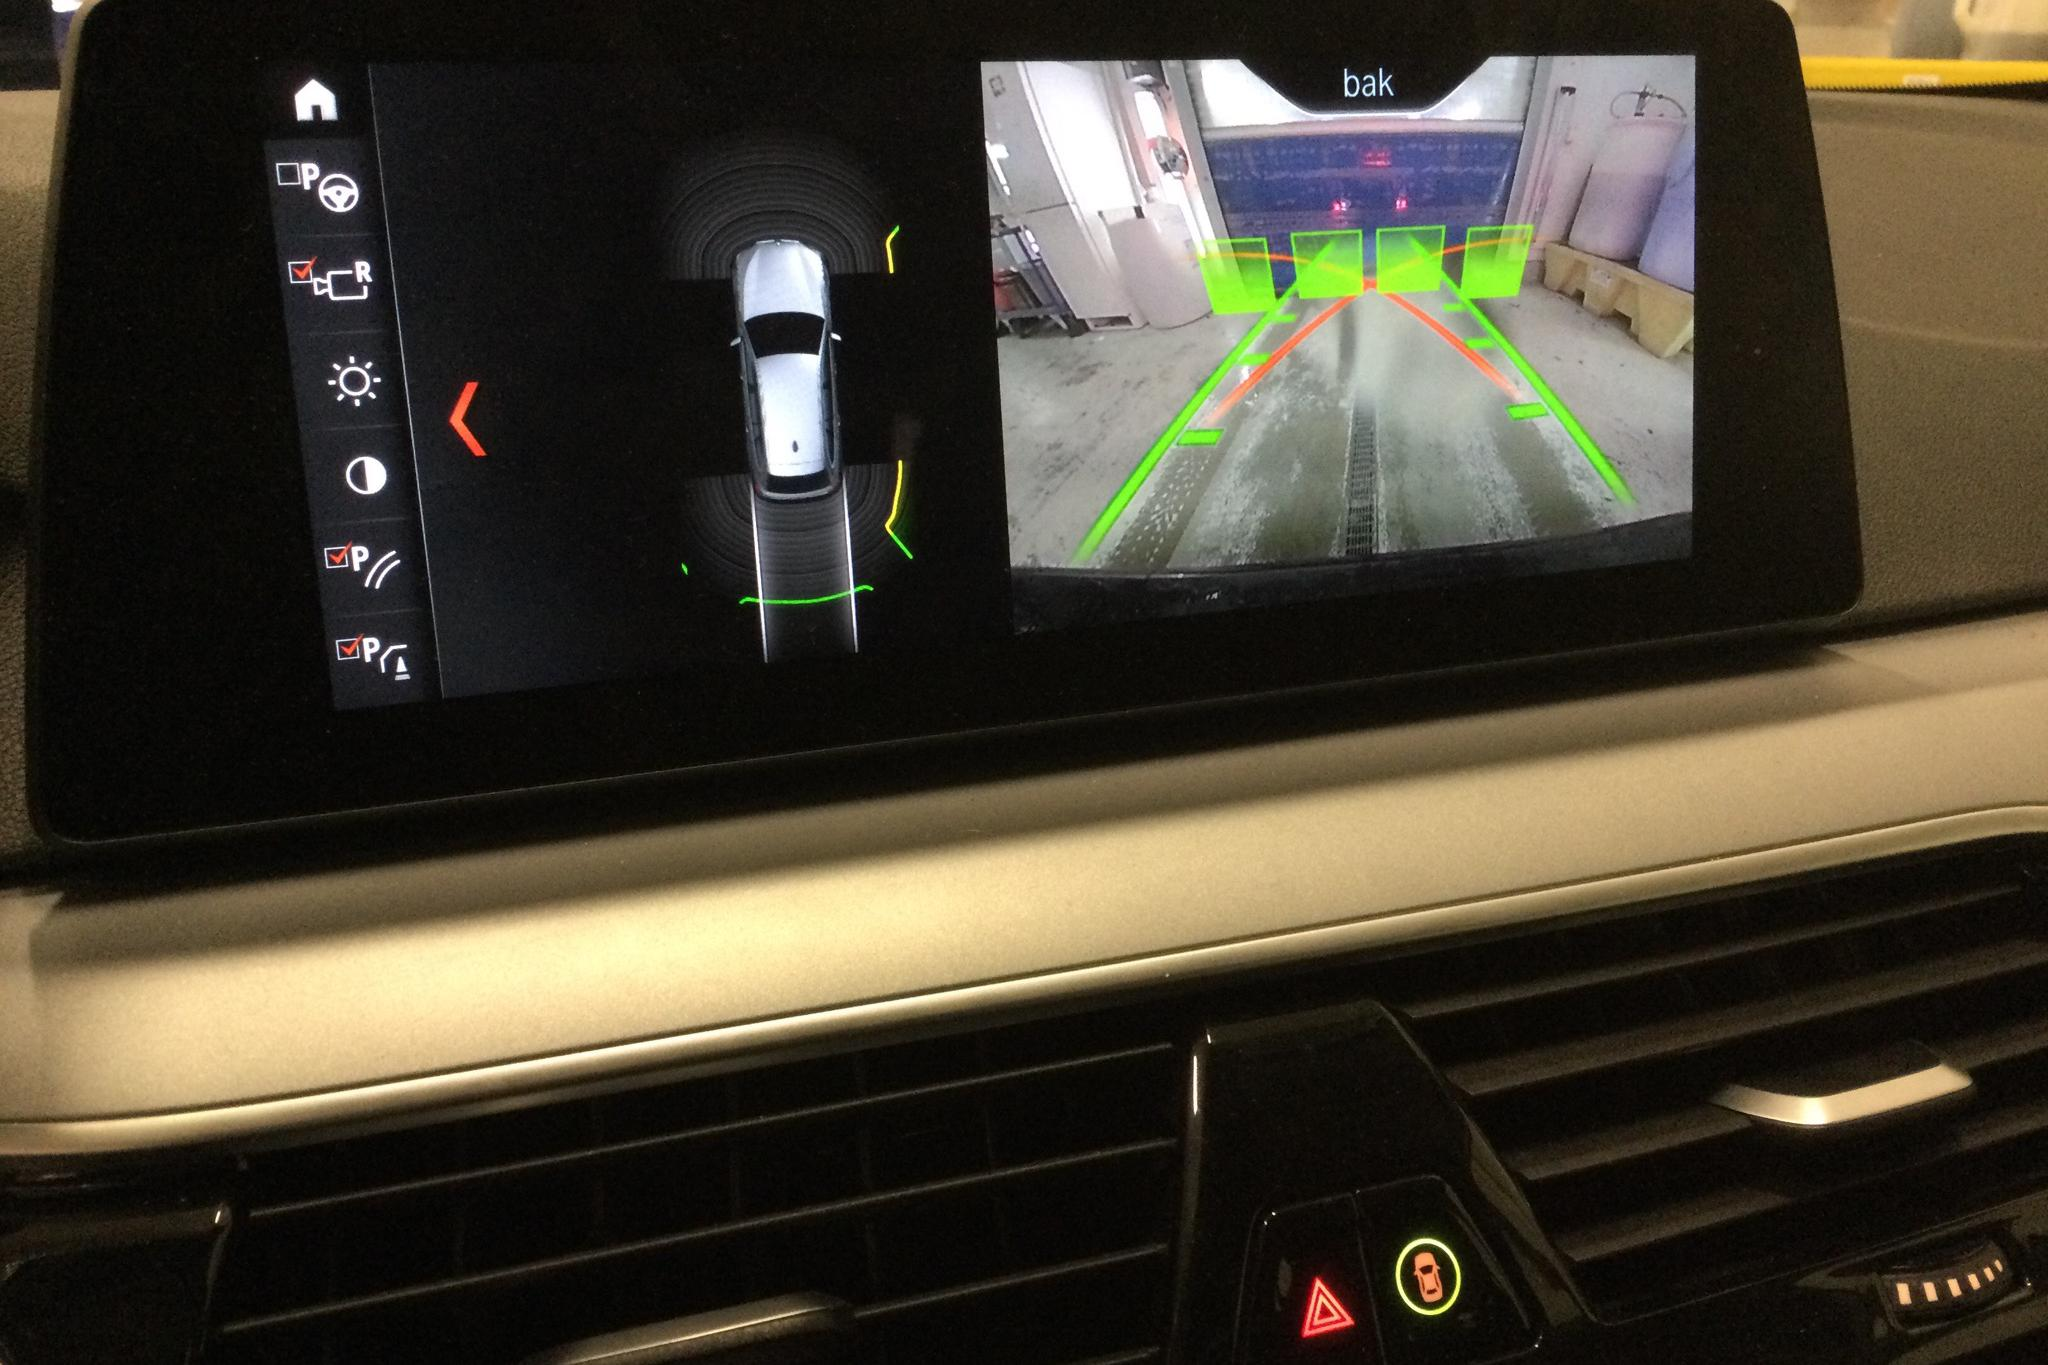 BMW 520d Touring, G31 (190hk) - 3 013 mil - Automat - svart - 2018